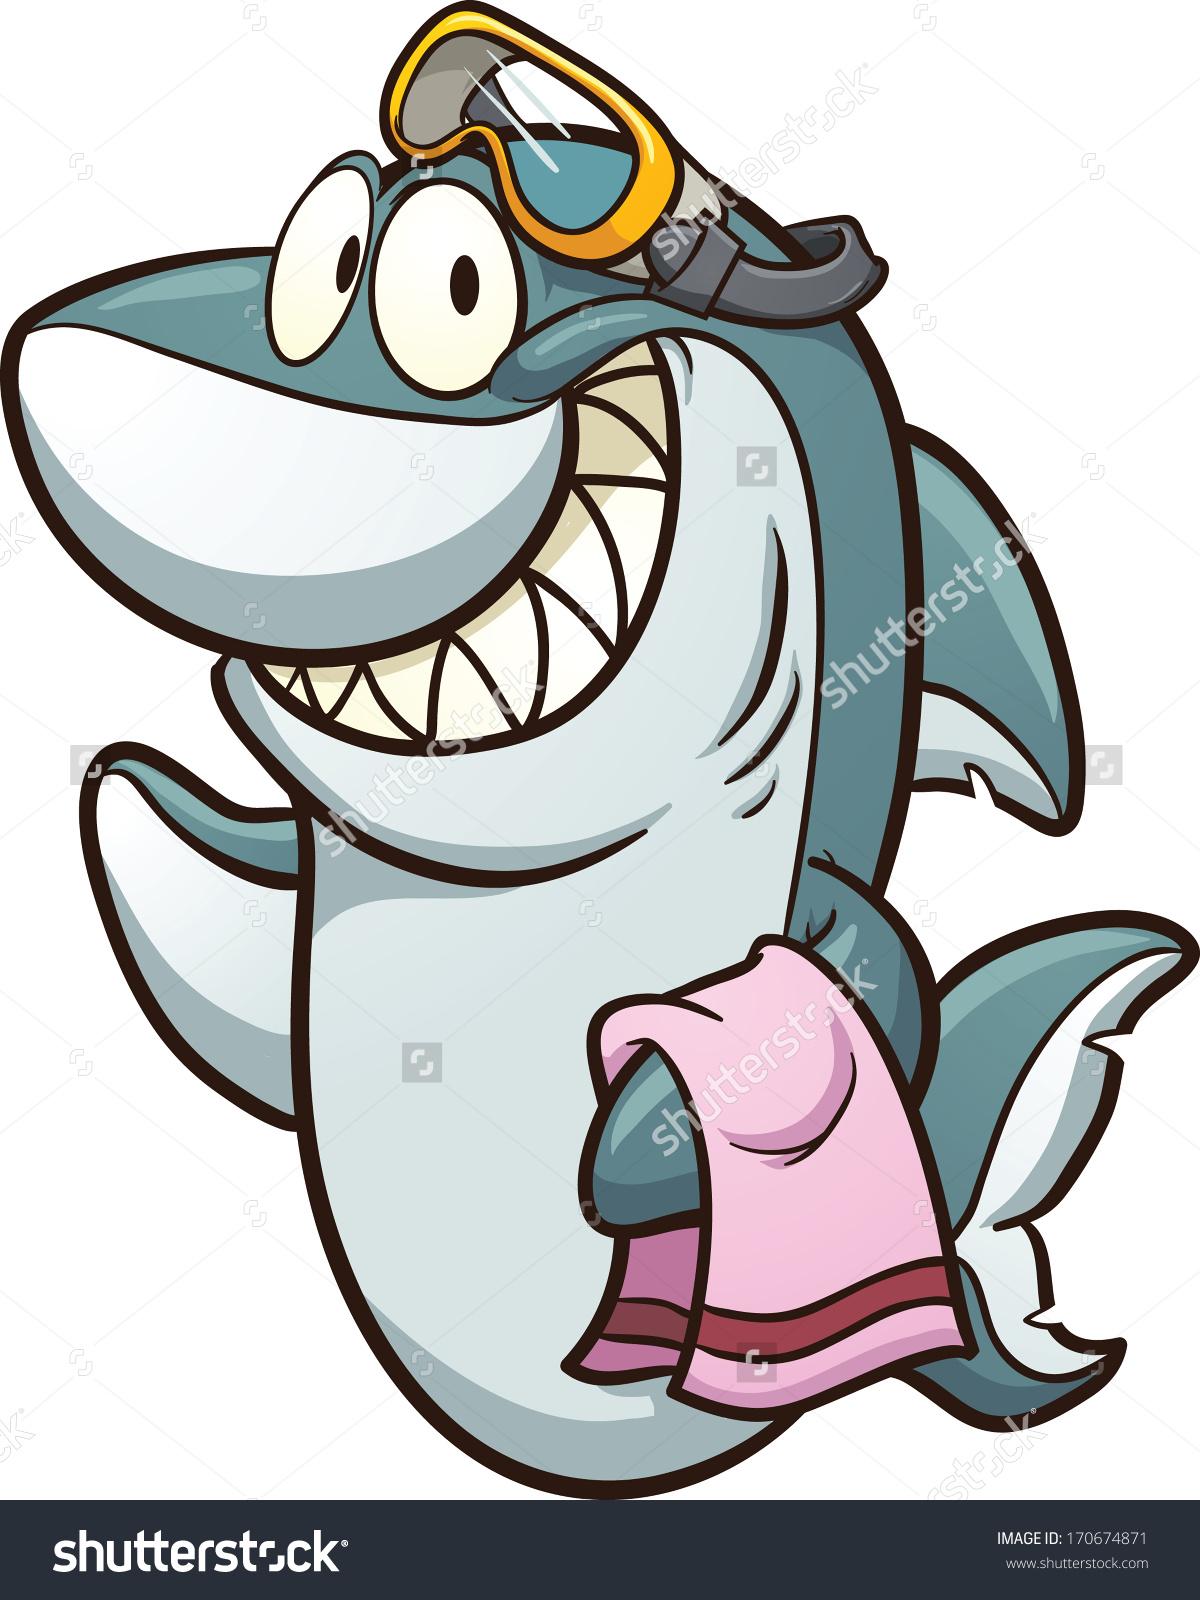 1200x1600 Cartoon Shark Wearing Goggles. Vector Clip Art Illustration